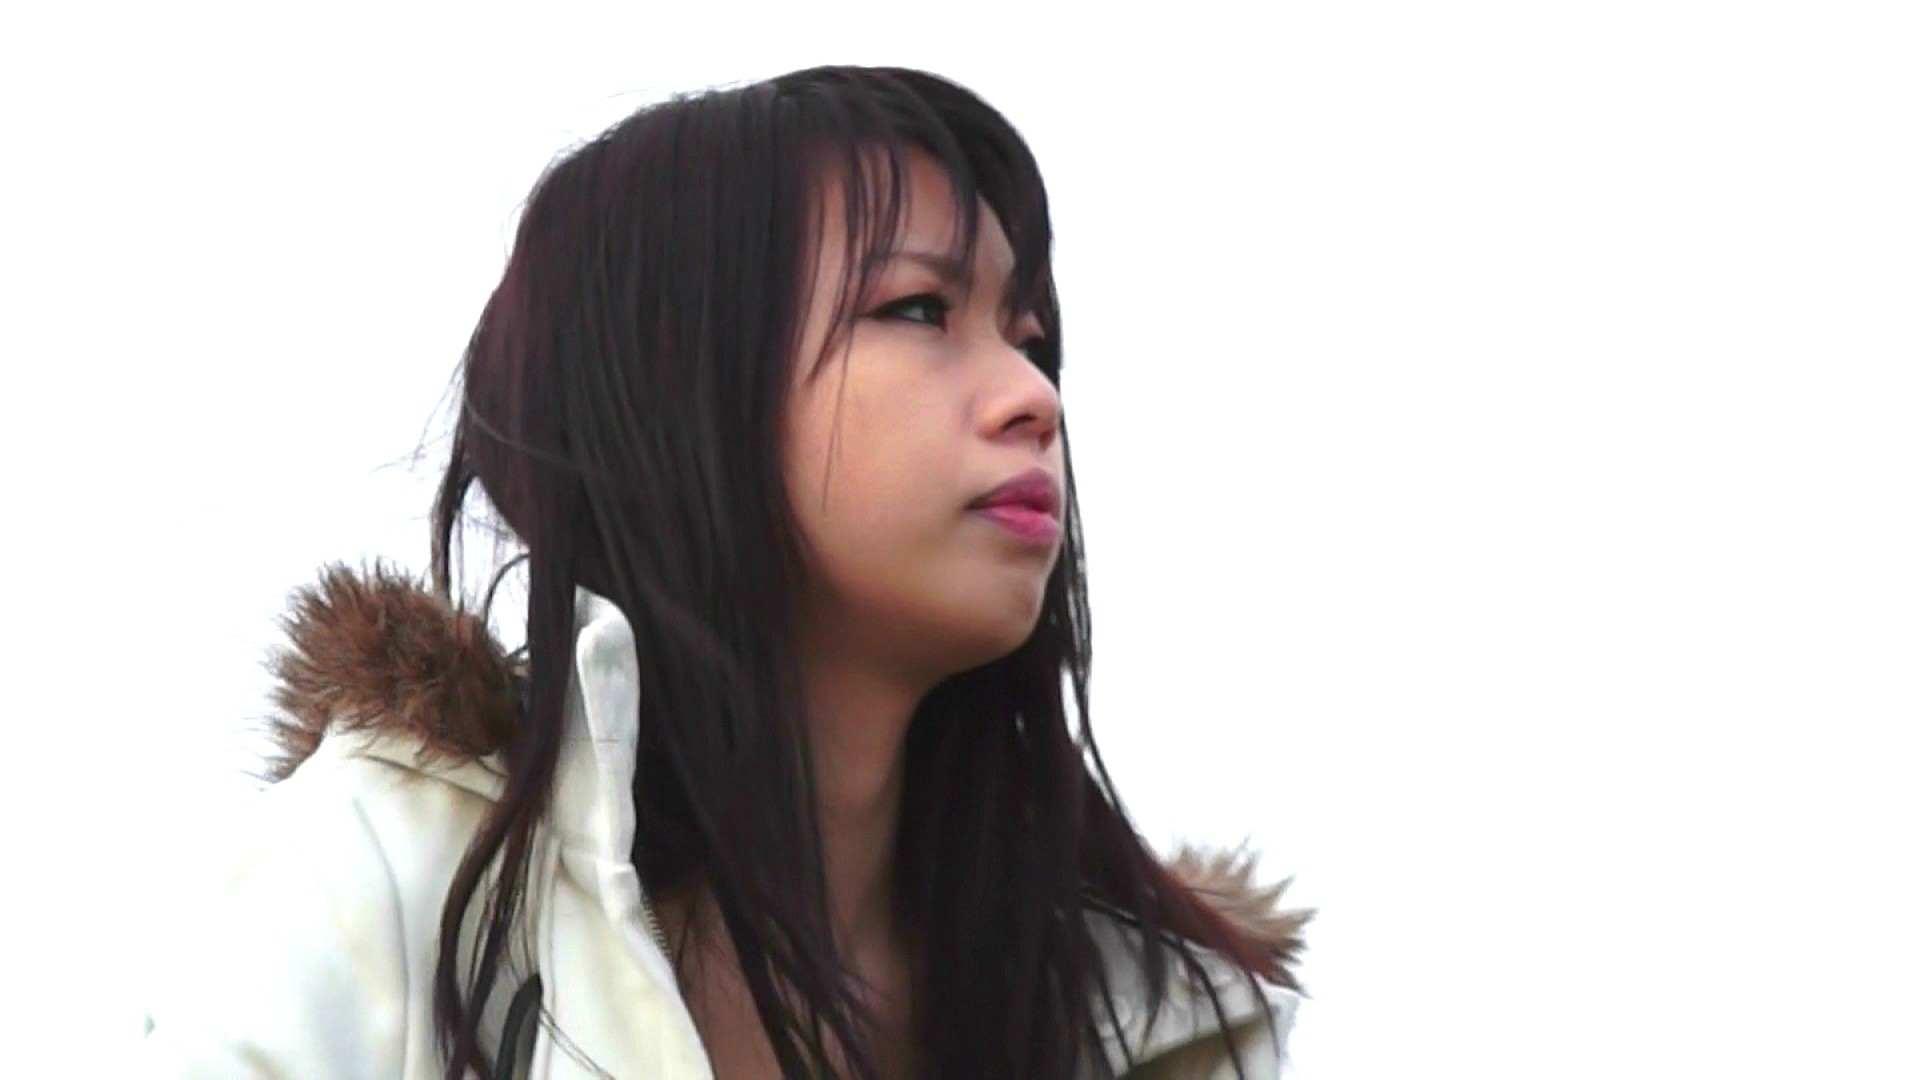 vol.2 自宅近く思い出の地で黄昏る志穂さん お姉さん攻略 | ○族  83画像 76